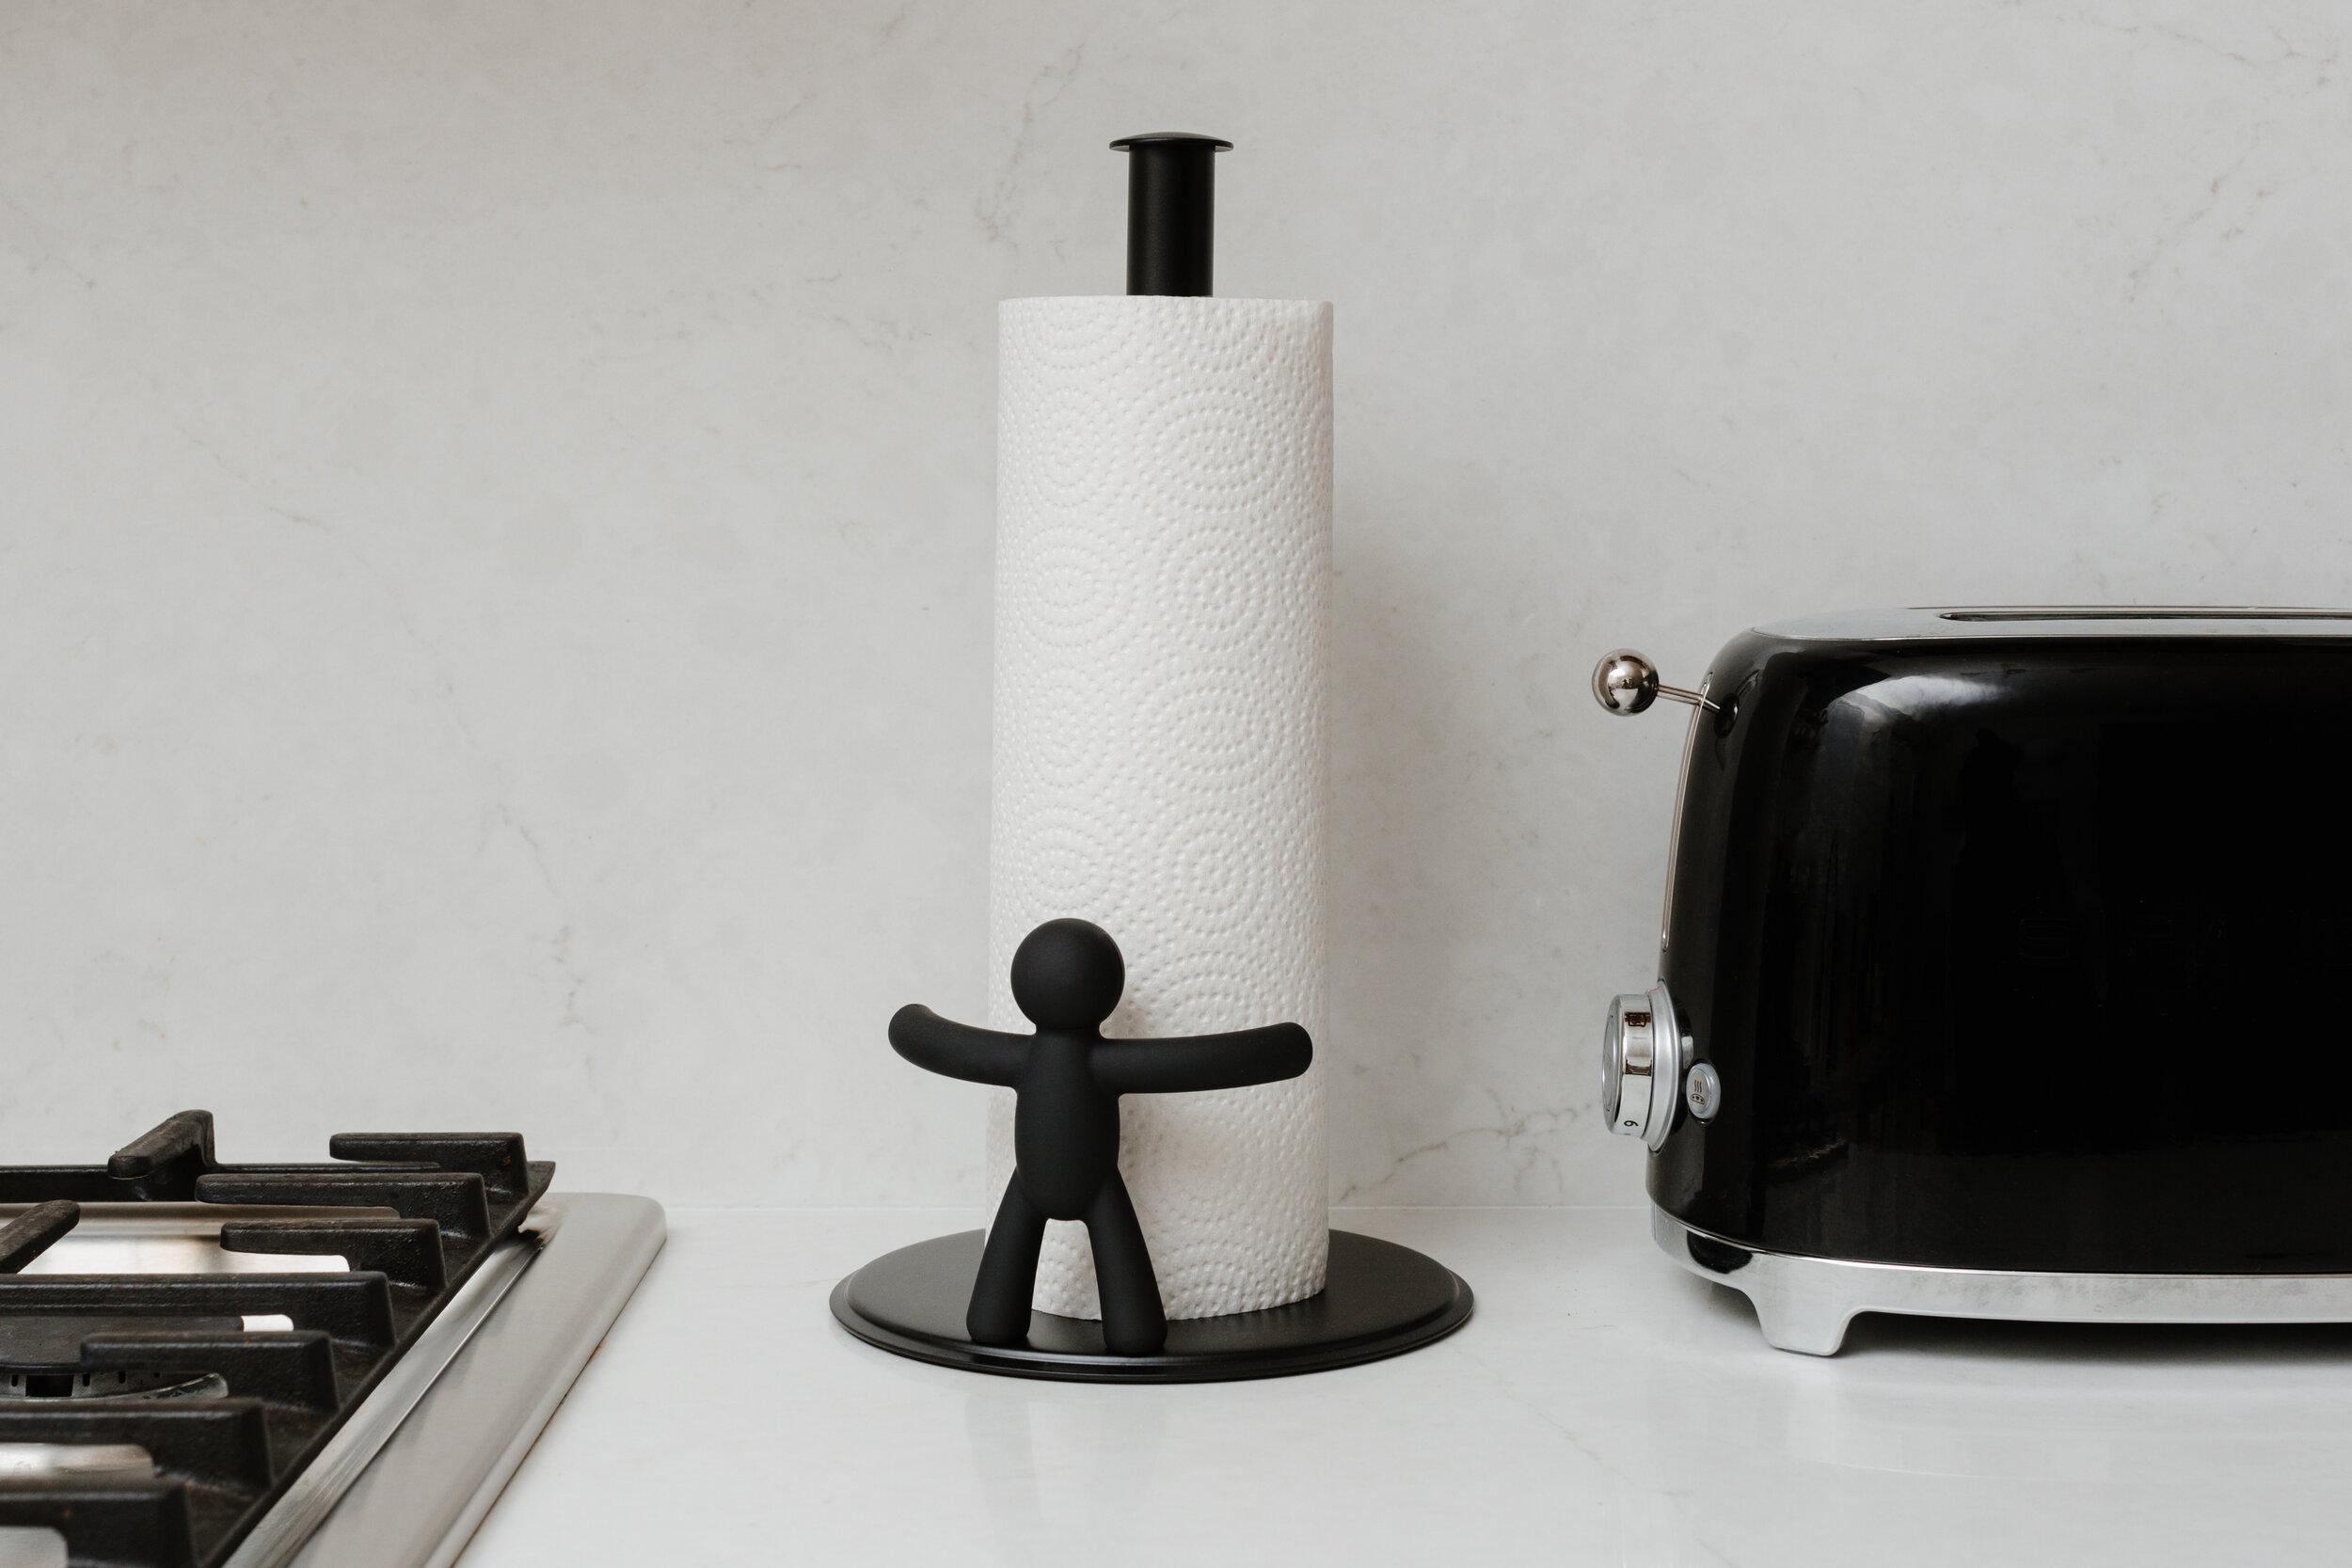 buddy-paper-towel-holder-32.jpg